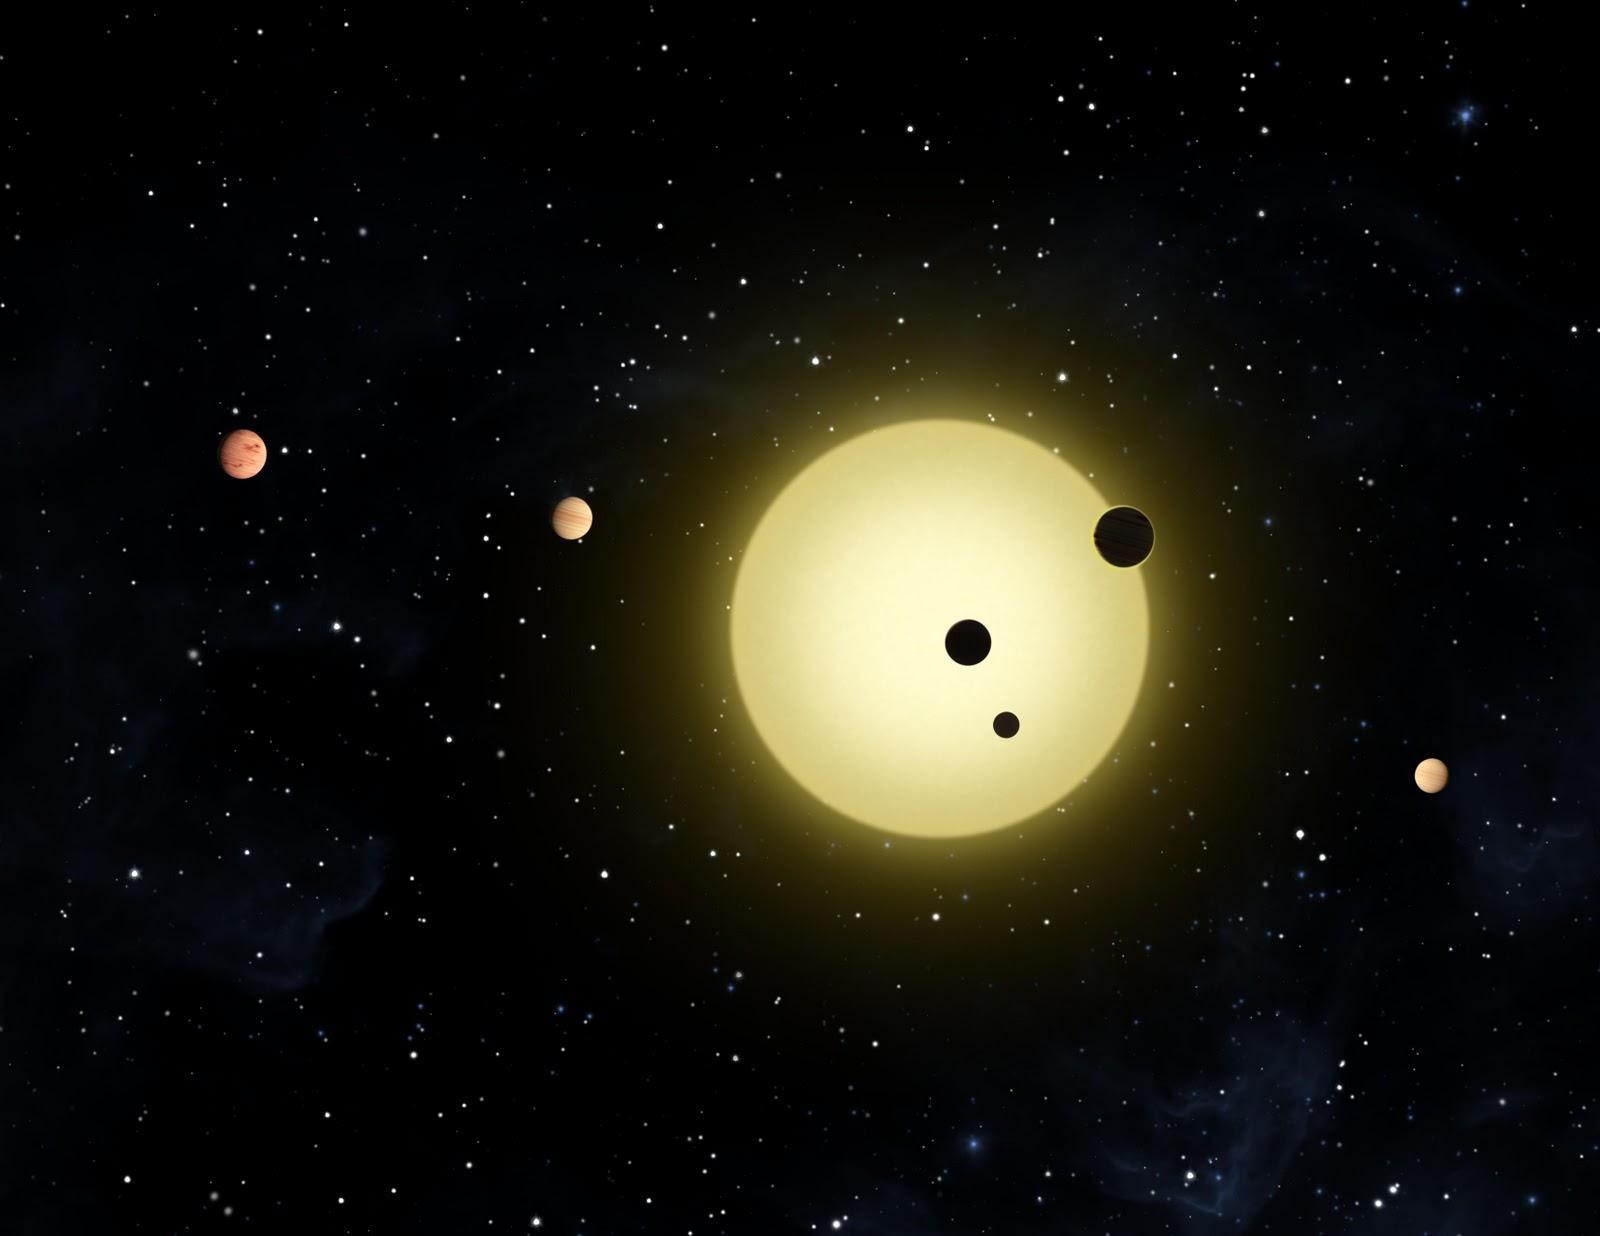 U Camelopardalis Mass Kepler-11 Planetary System